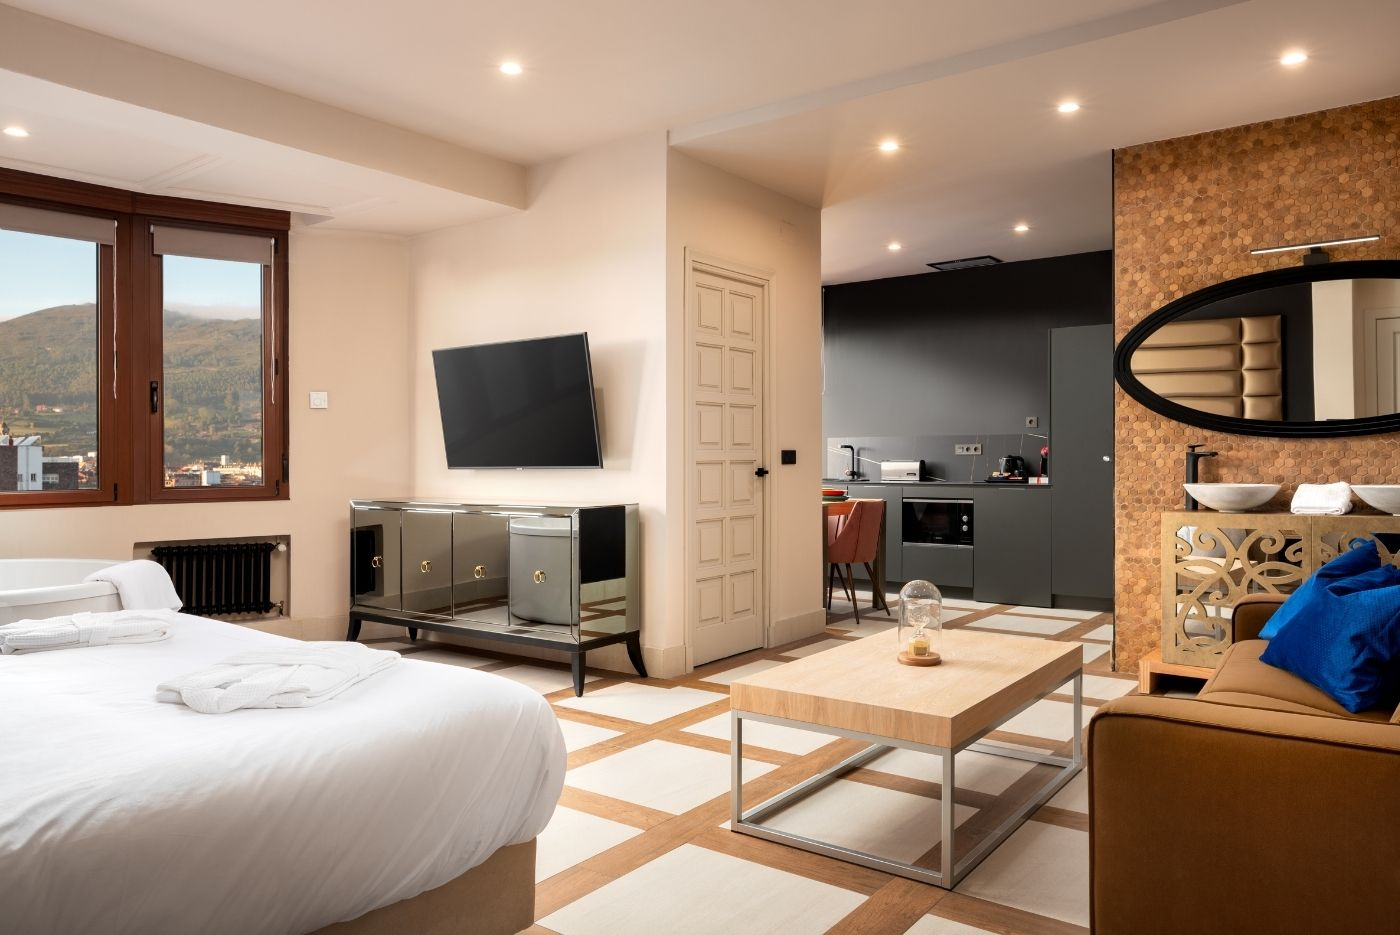 Apartamento-Suite-Deluxe-64-Oviedo-1907-02